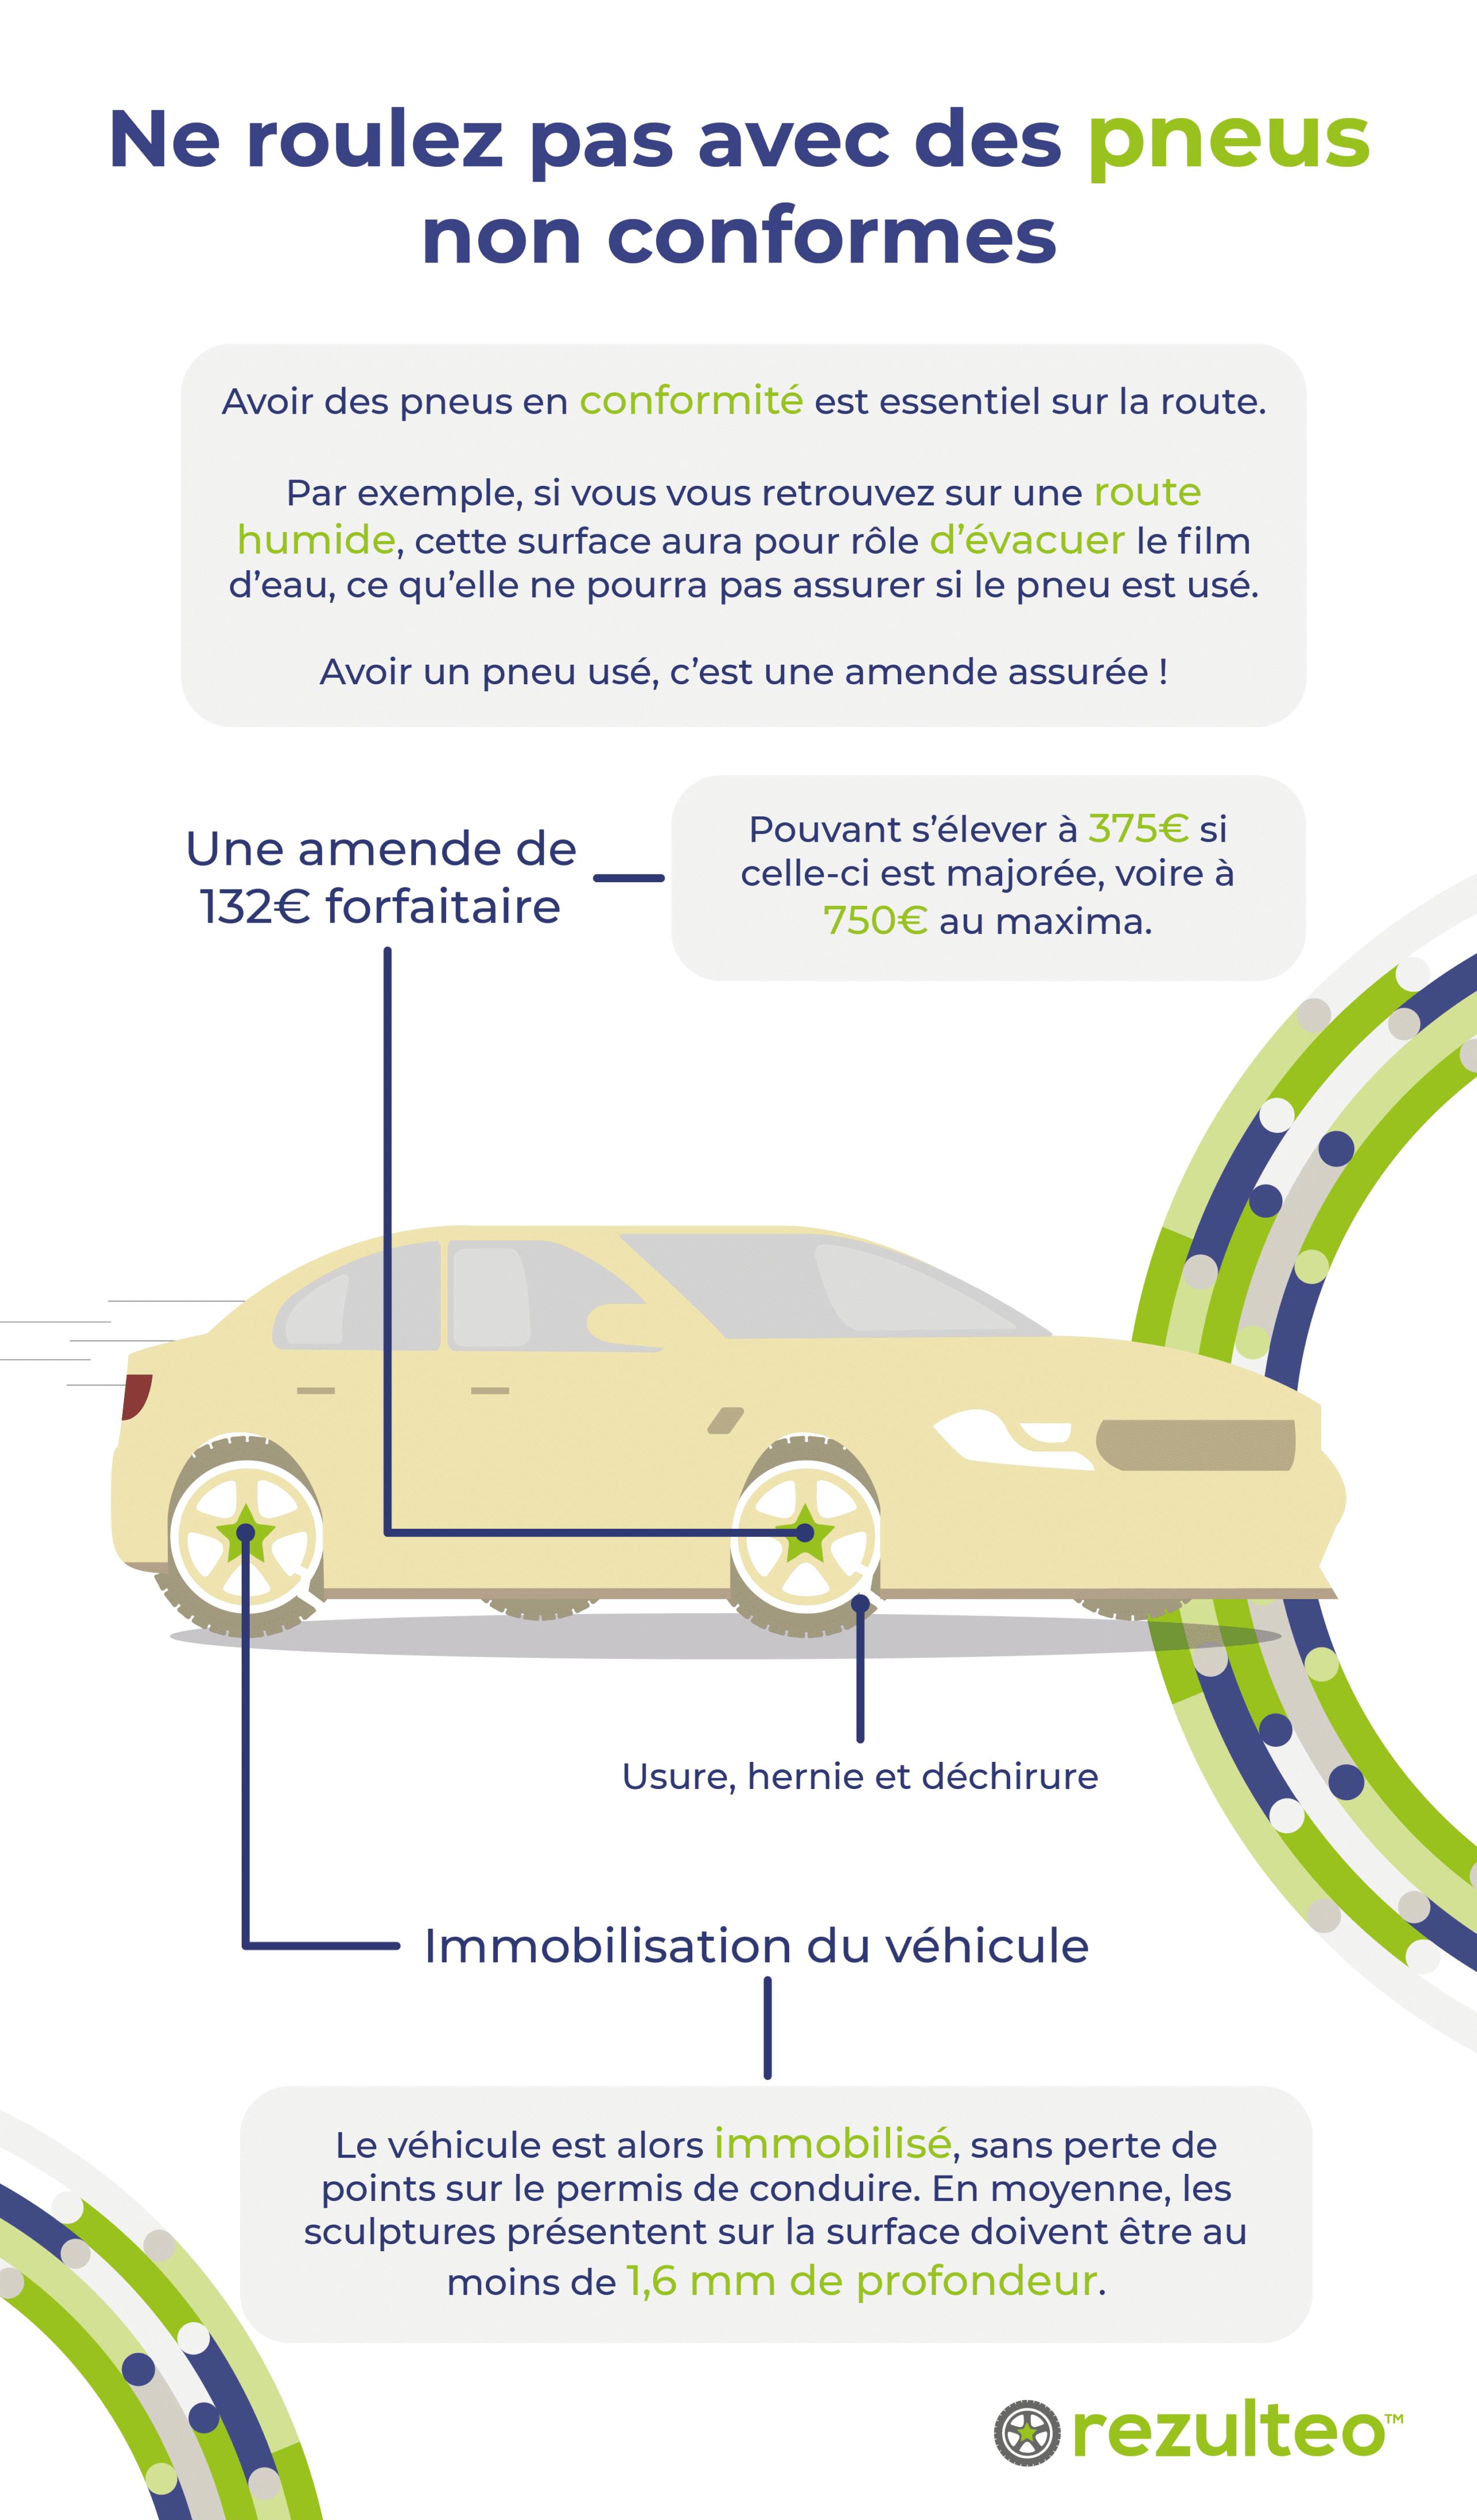 Usure du pneu : amende pour pneu lisse, pneu usé : hernie pneu, déchirure...